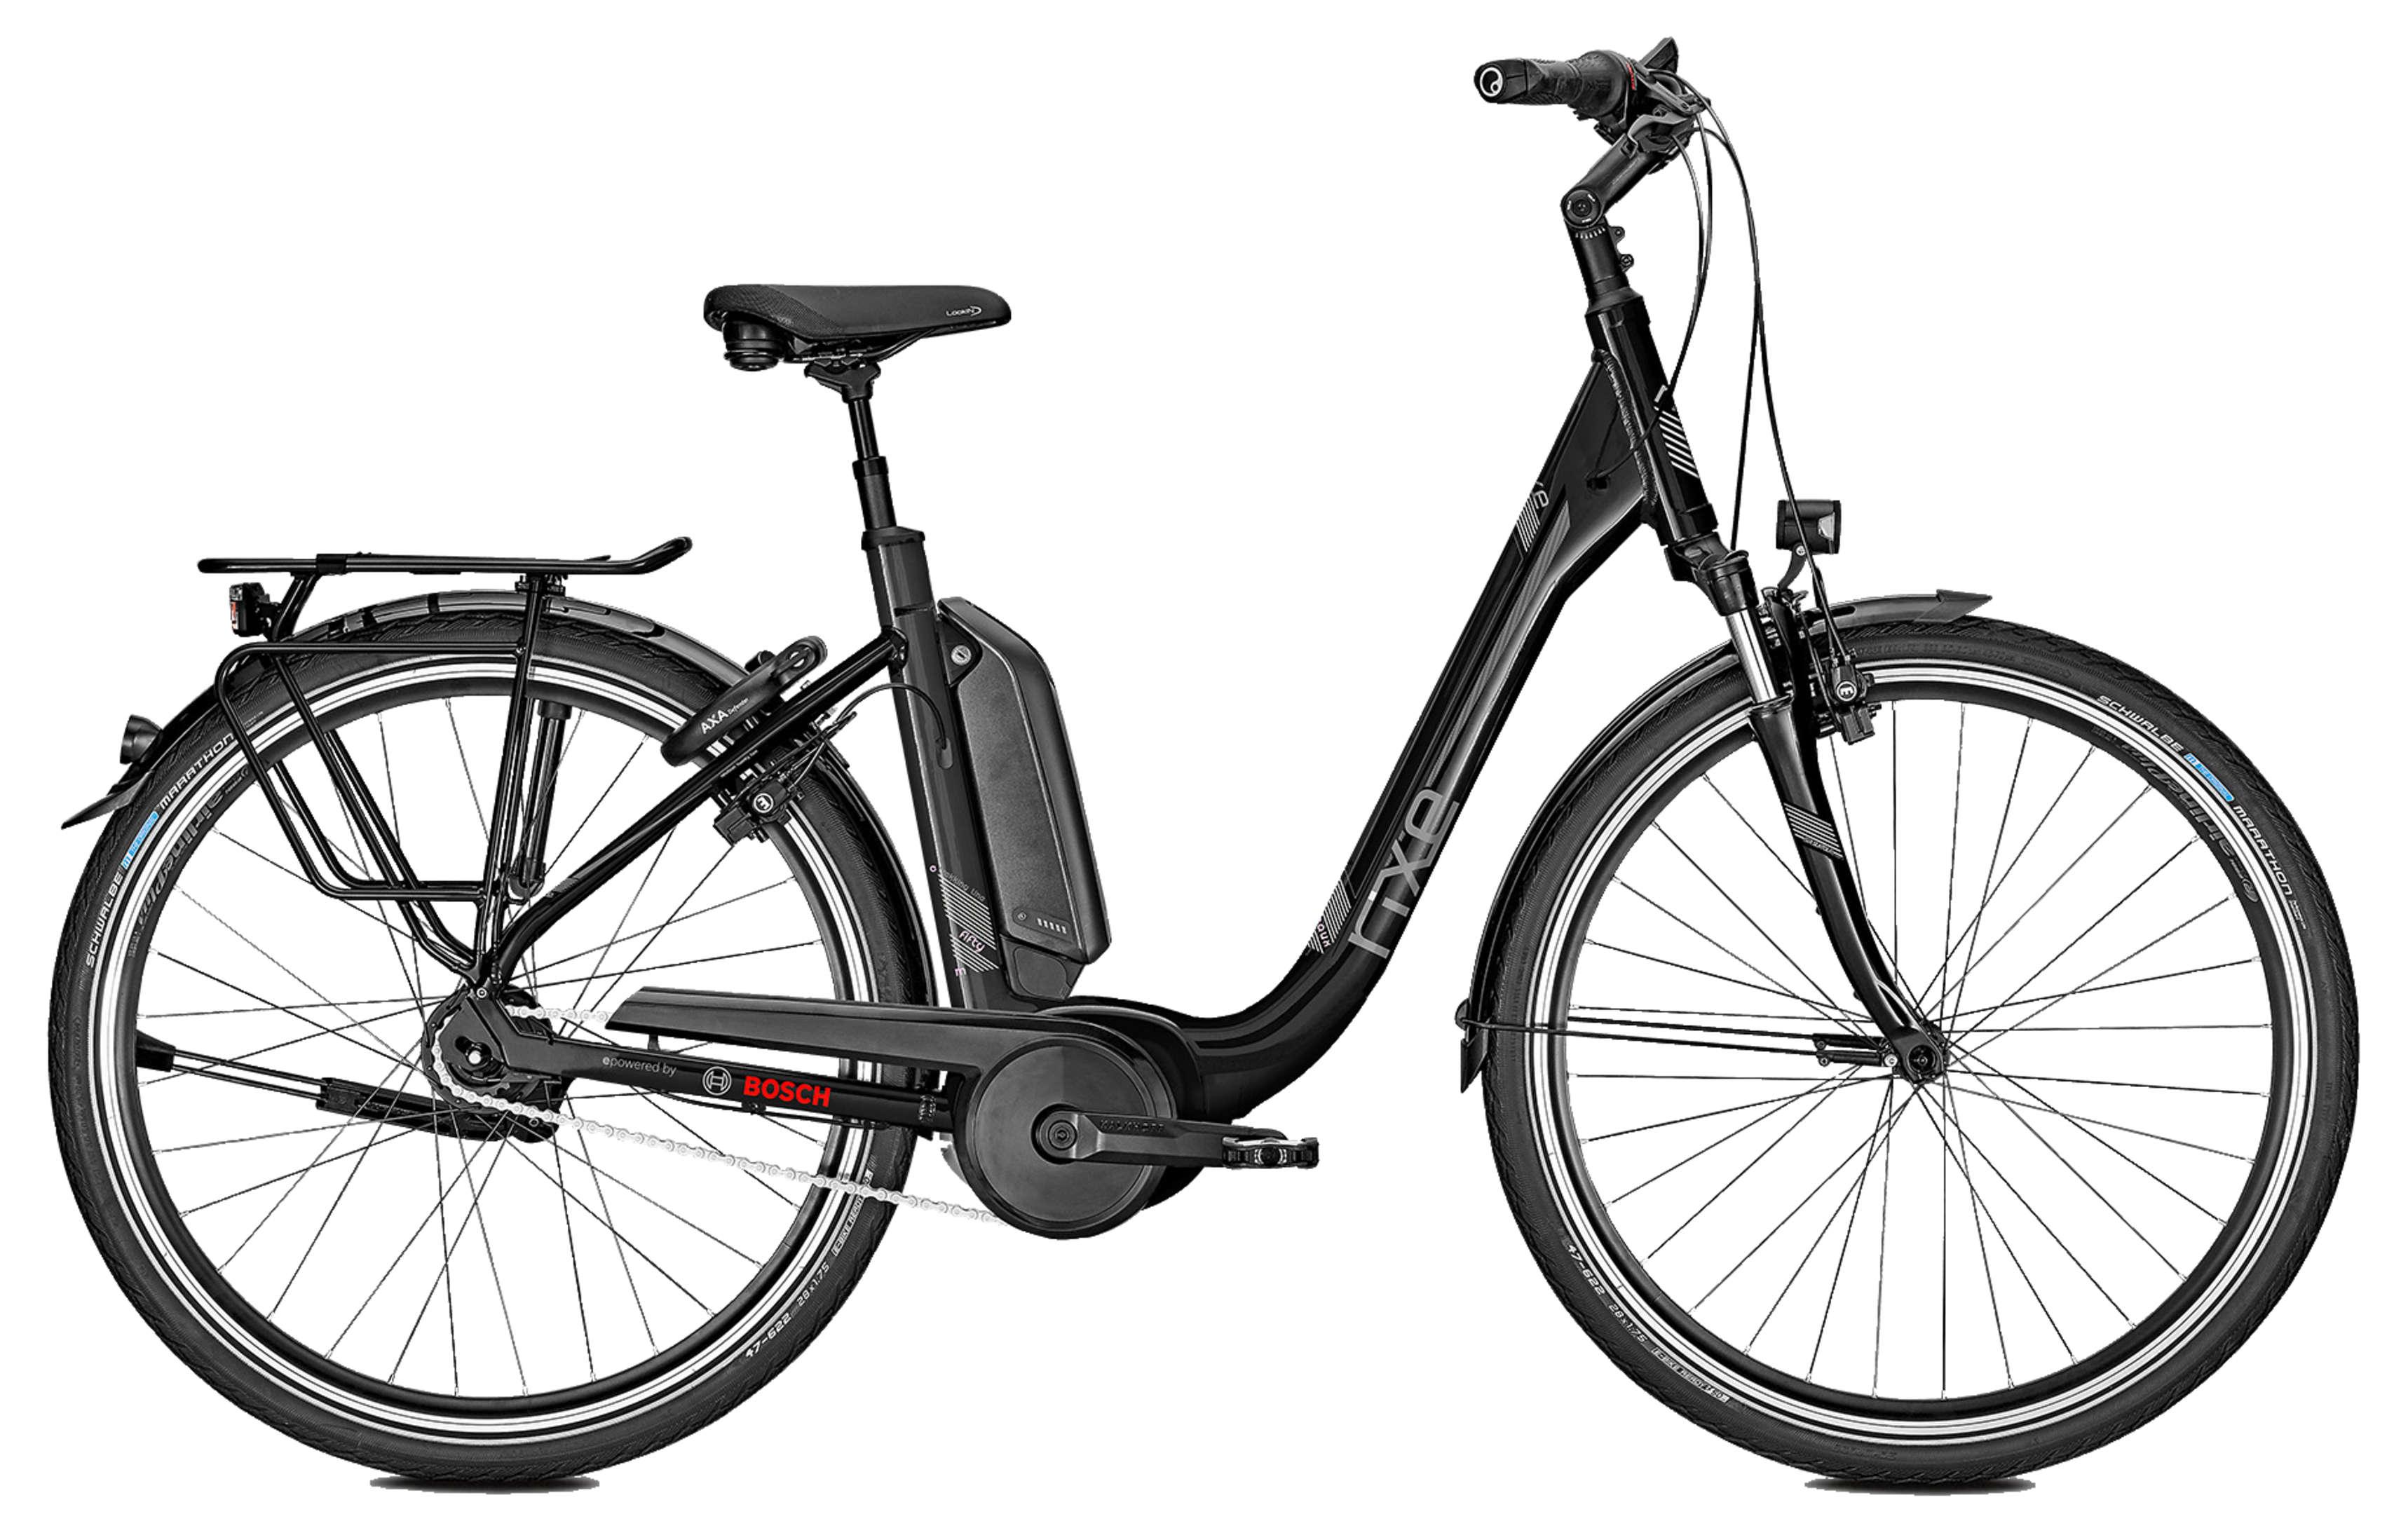 rixe e bike bordeaux b8r comfort 13 4ah 36 eurorad. Black Bedroom Furniture Sets. Home Design Ideas